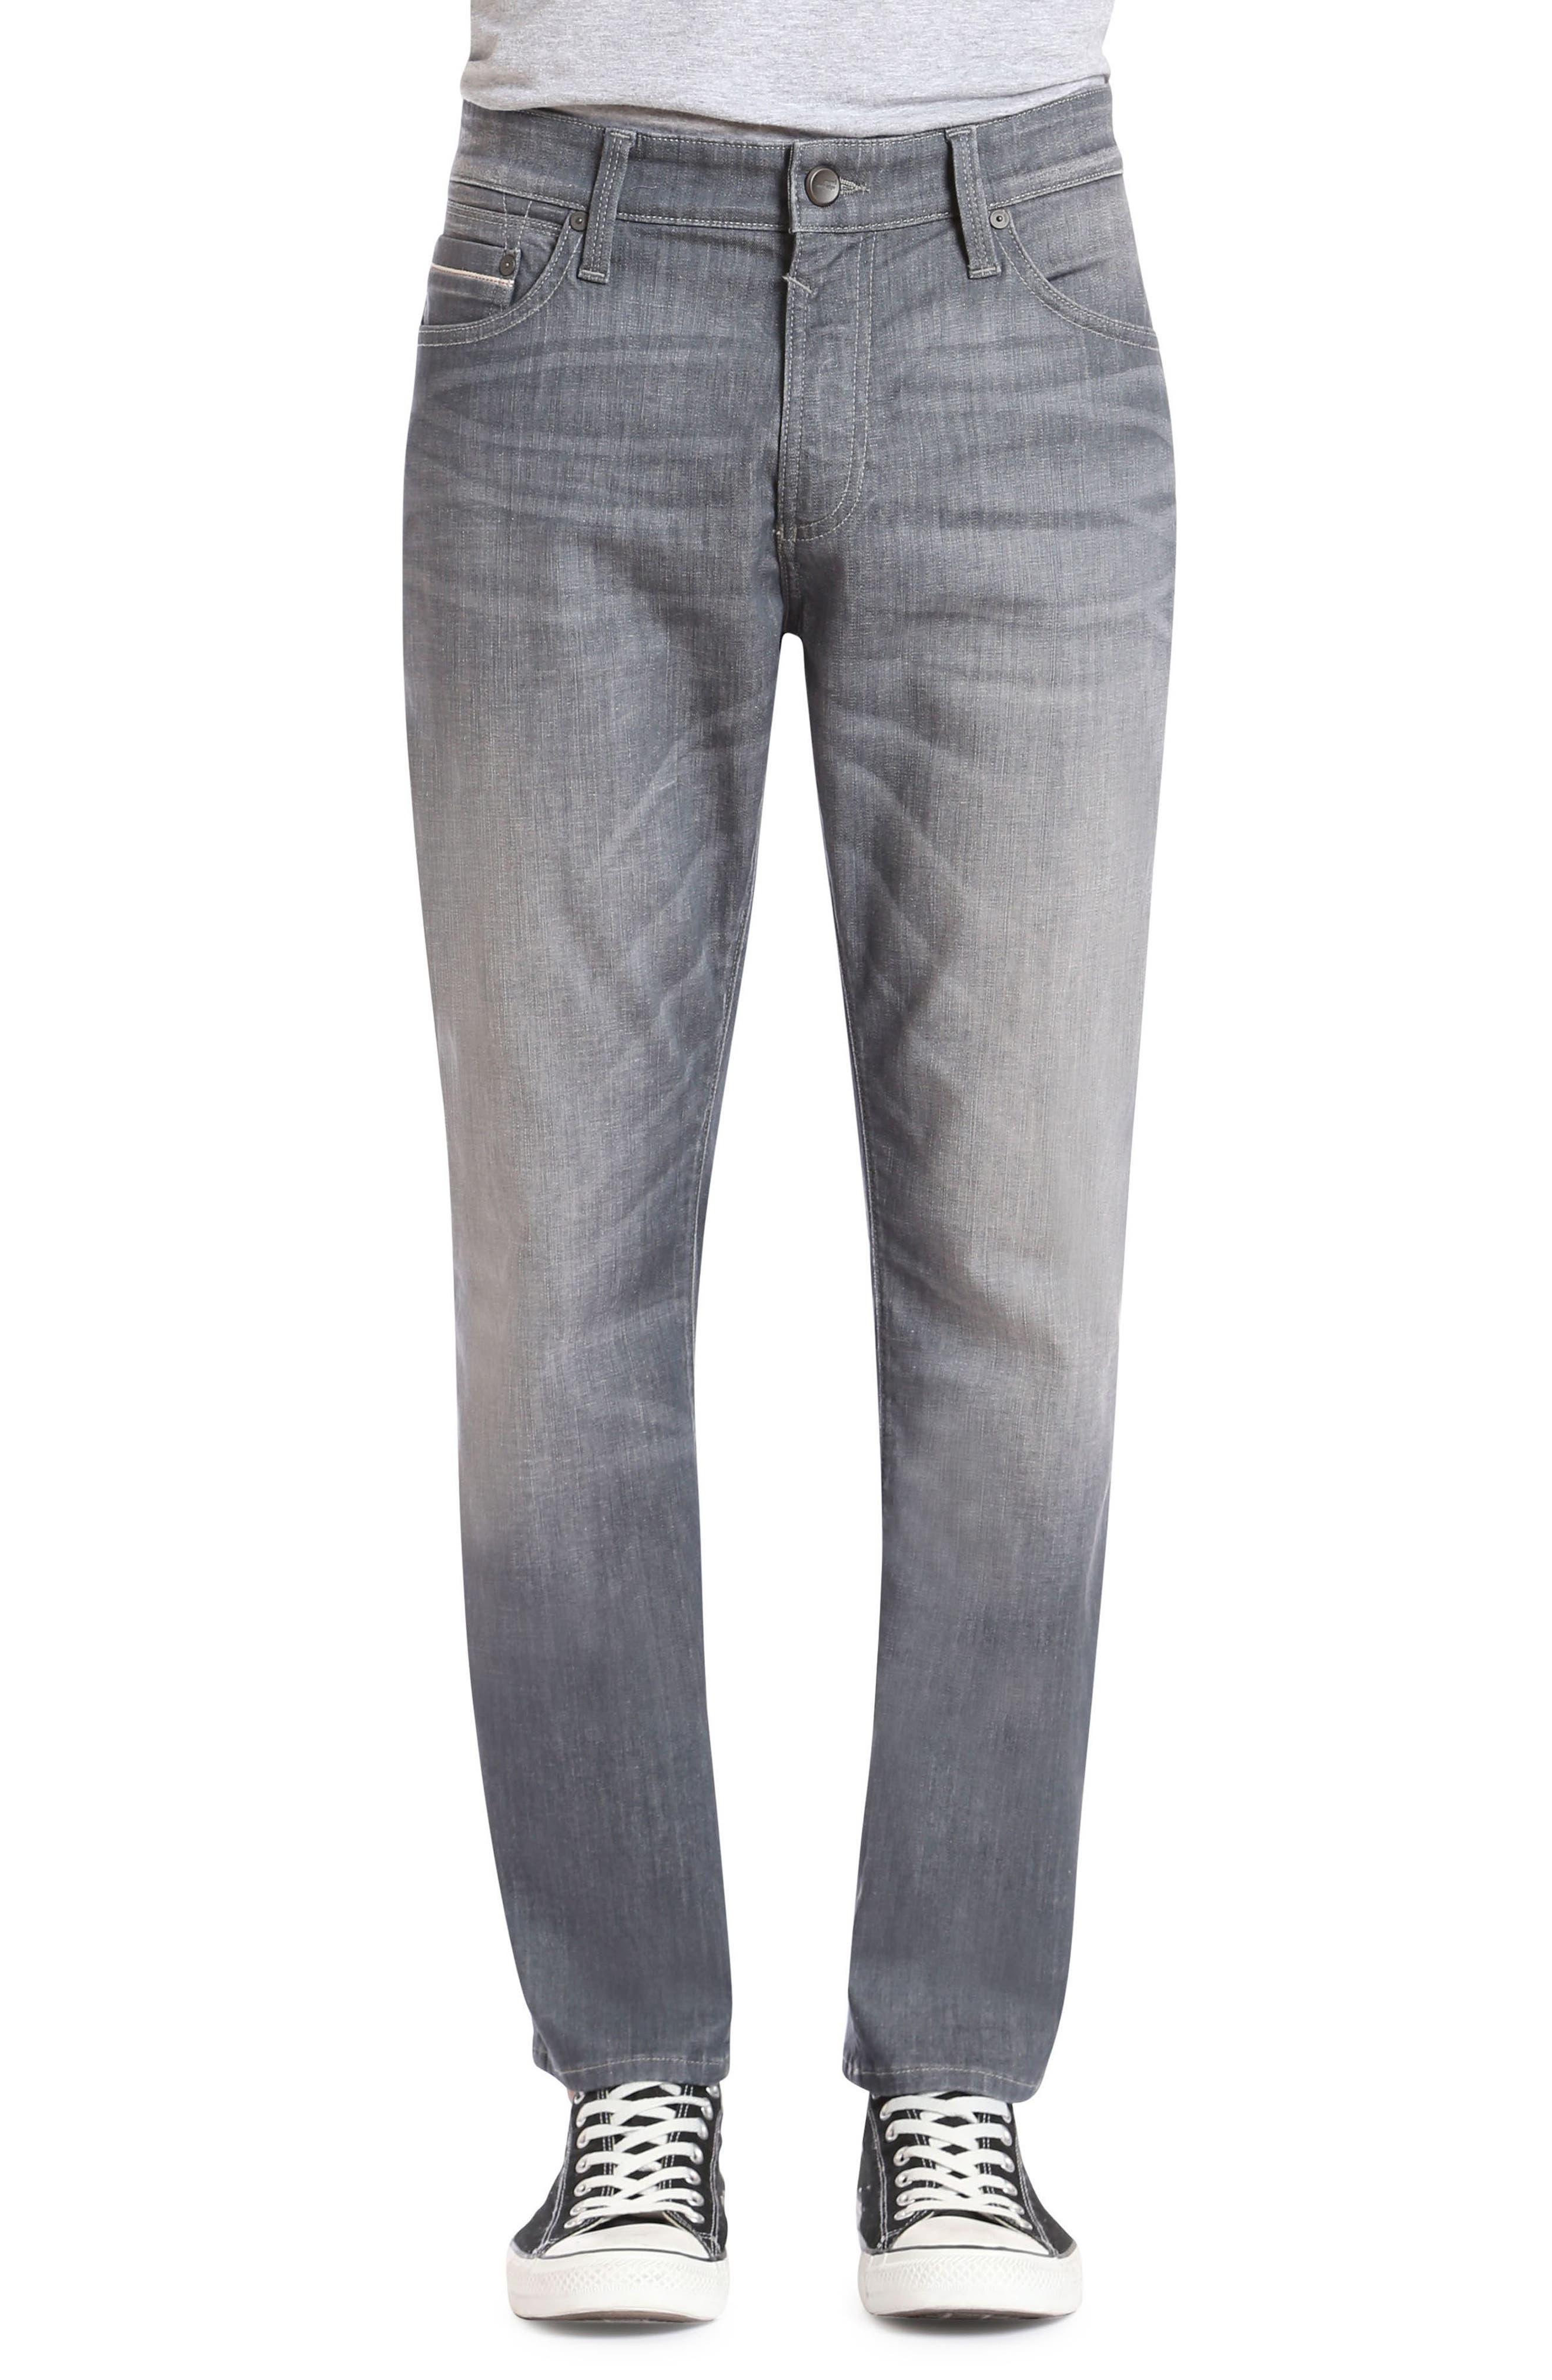 Alternate Image 1 Selected - Mavi Jeans Marcus Slim Straight Leg Jeans (Light Grey White Edge)